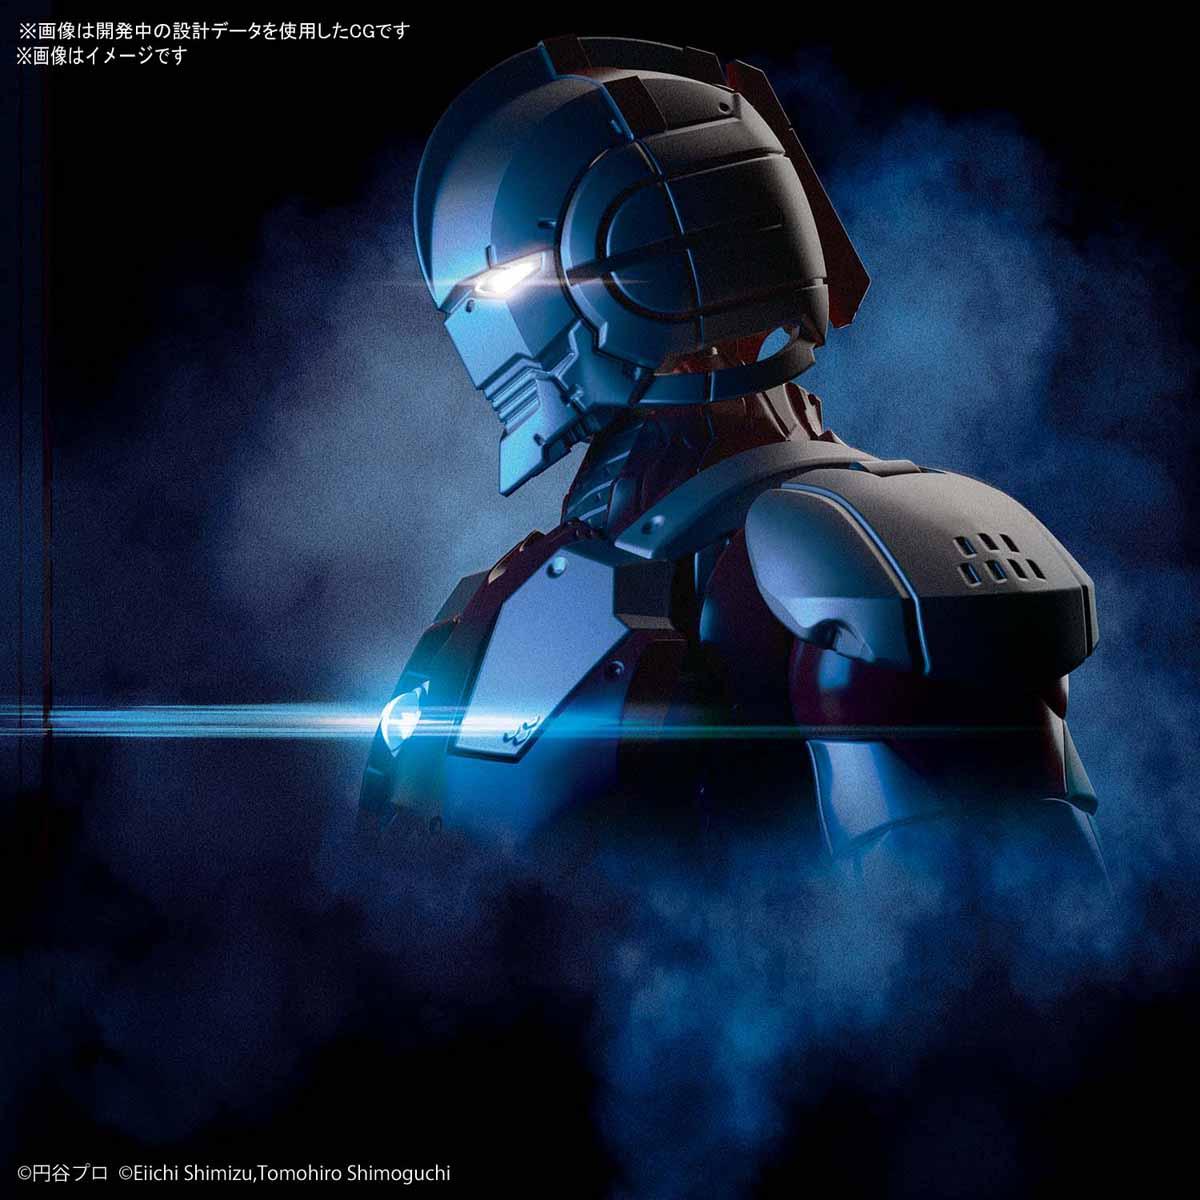 Wasabi Toys Website Gundam Mg Rx78 2 Verka 114215 Scale Release Date December 2018